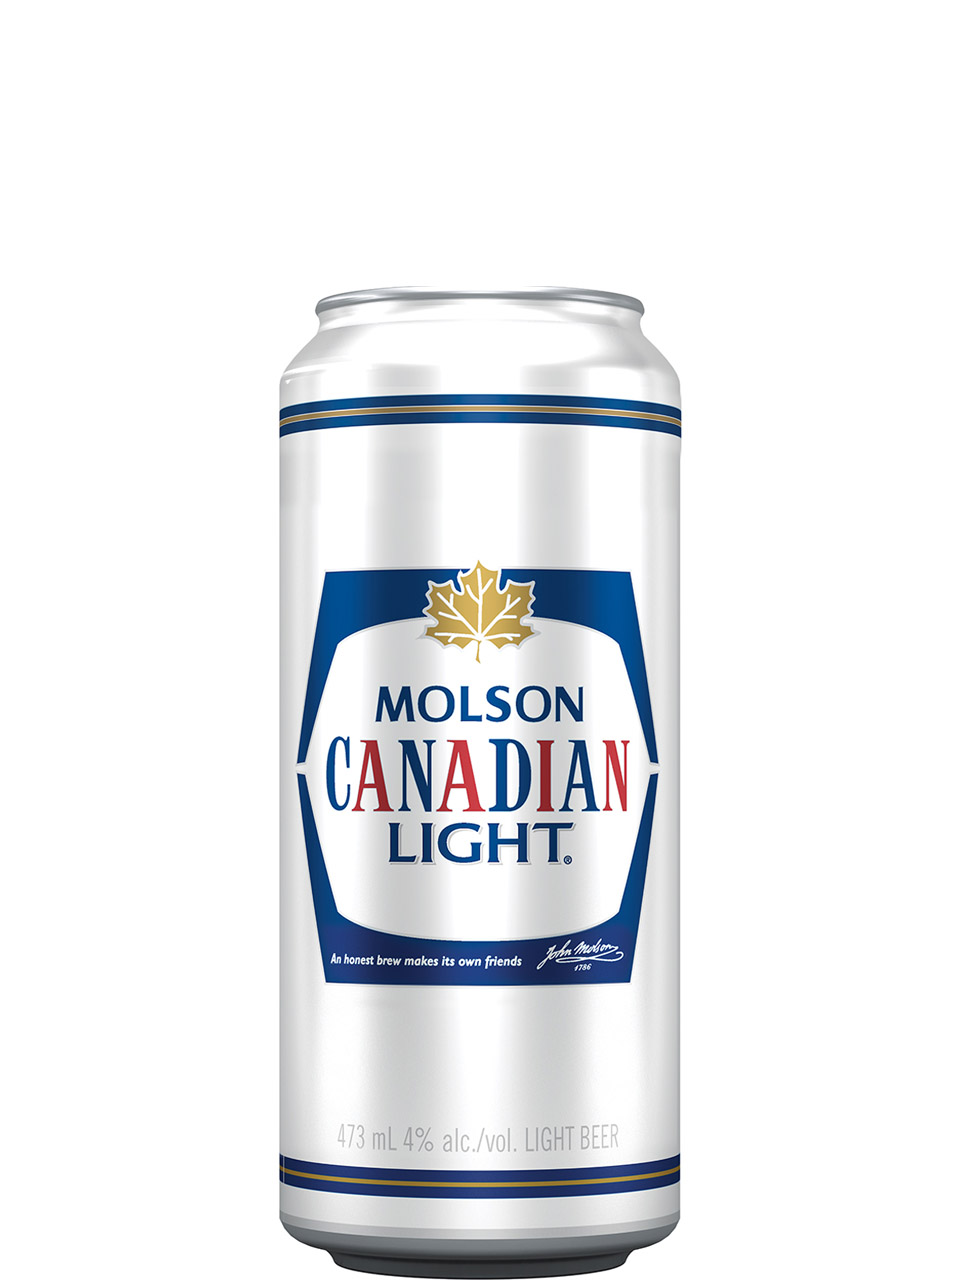 Molson Canadian Light 473ml Can